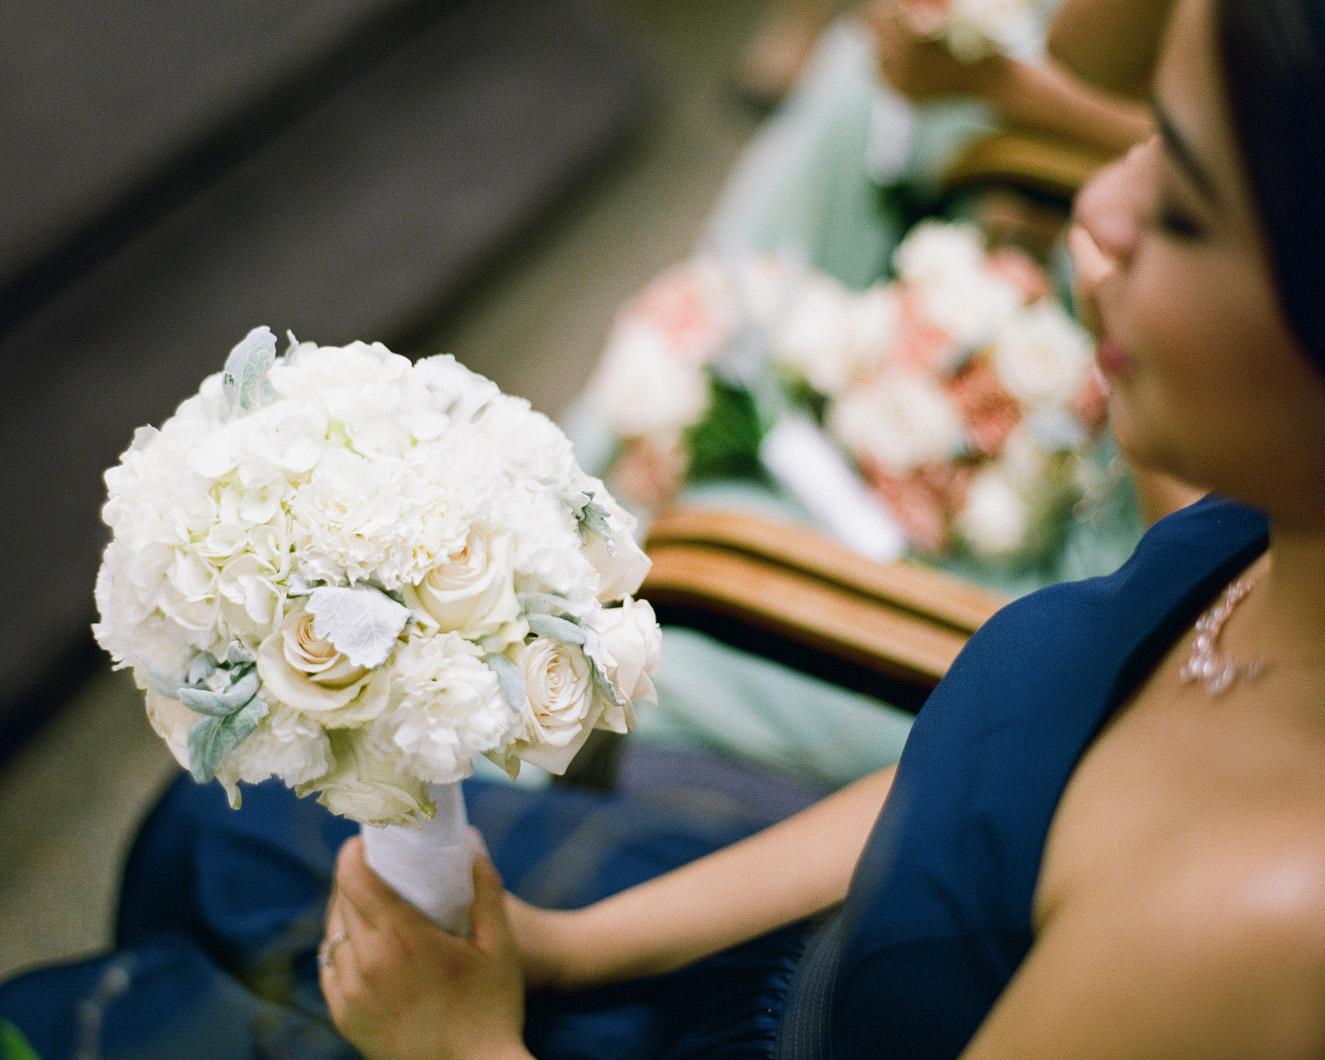 24_wedding-bouquet-of-flowers-nyc.jpg